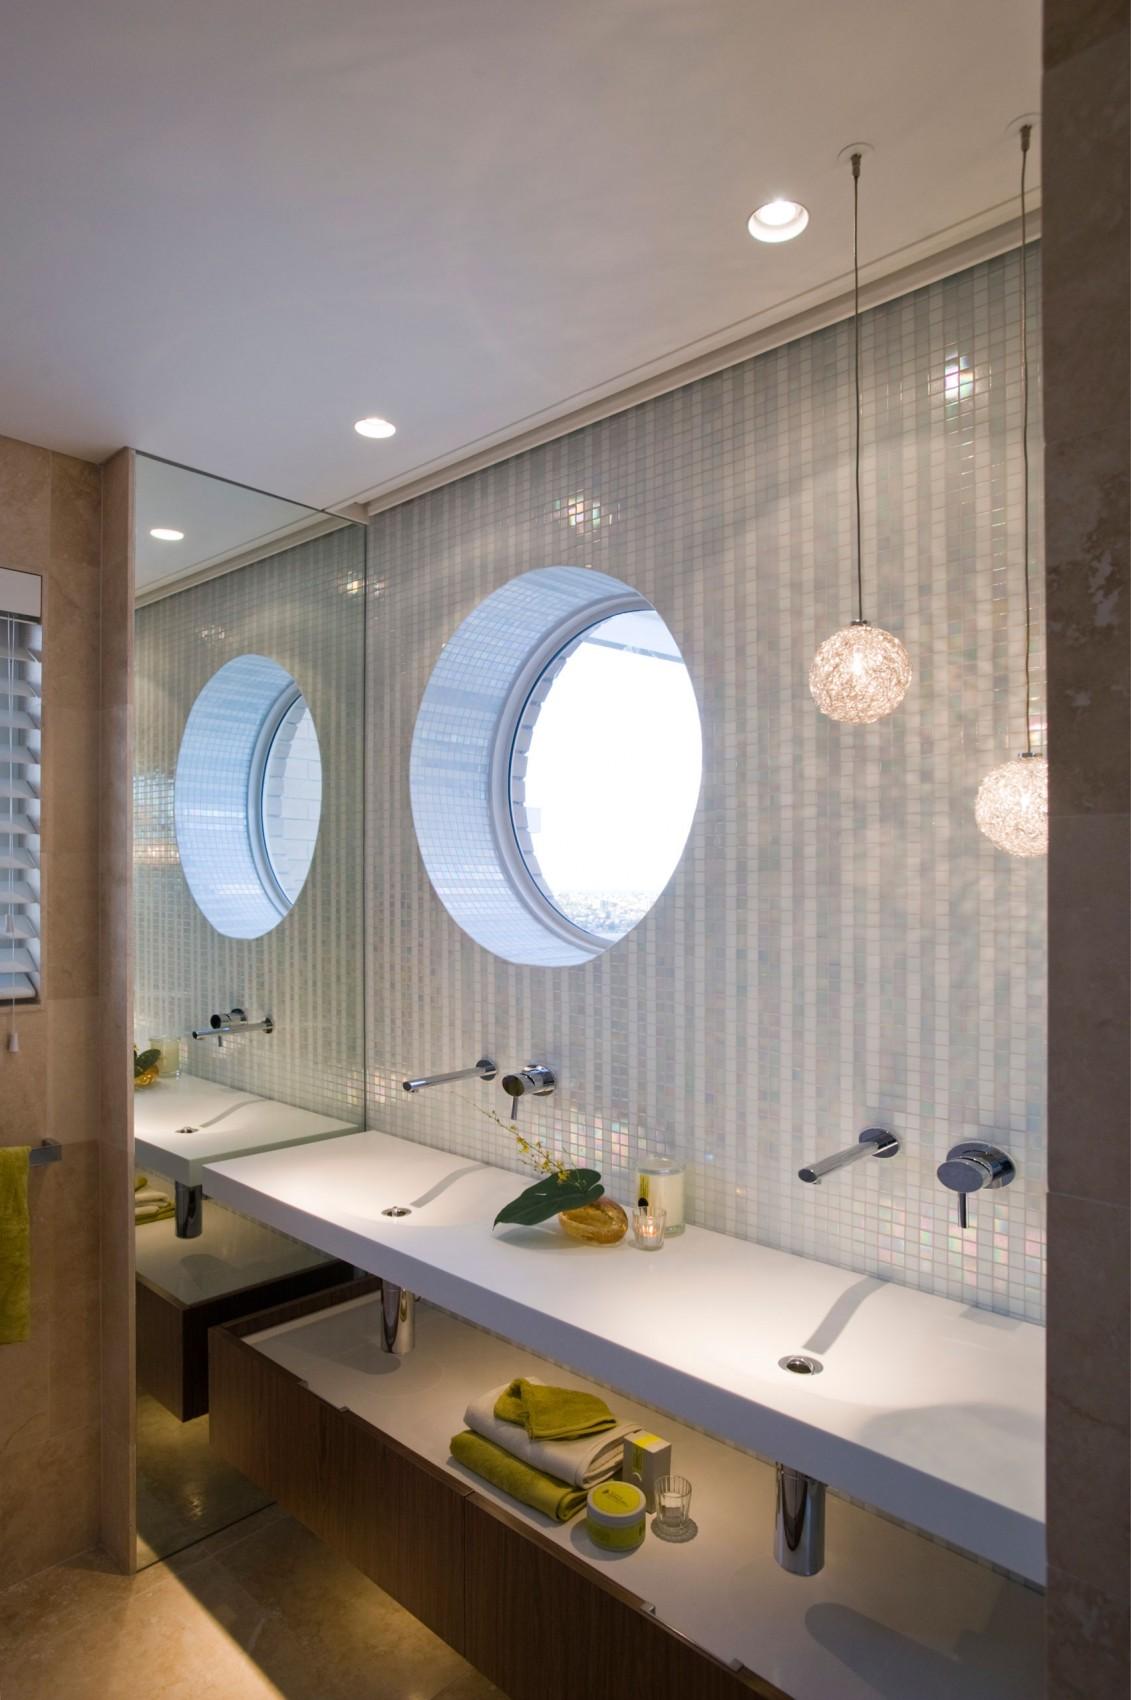 once-sonra-banyo-dekorasyonu (3)